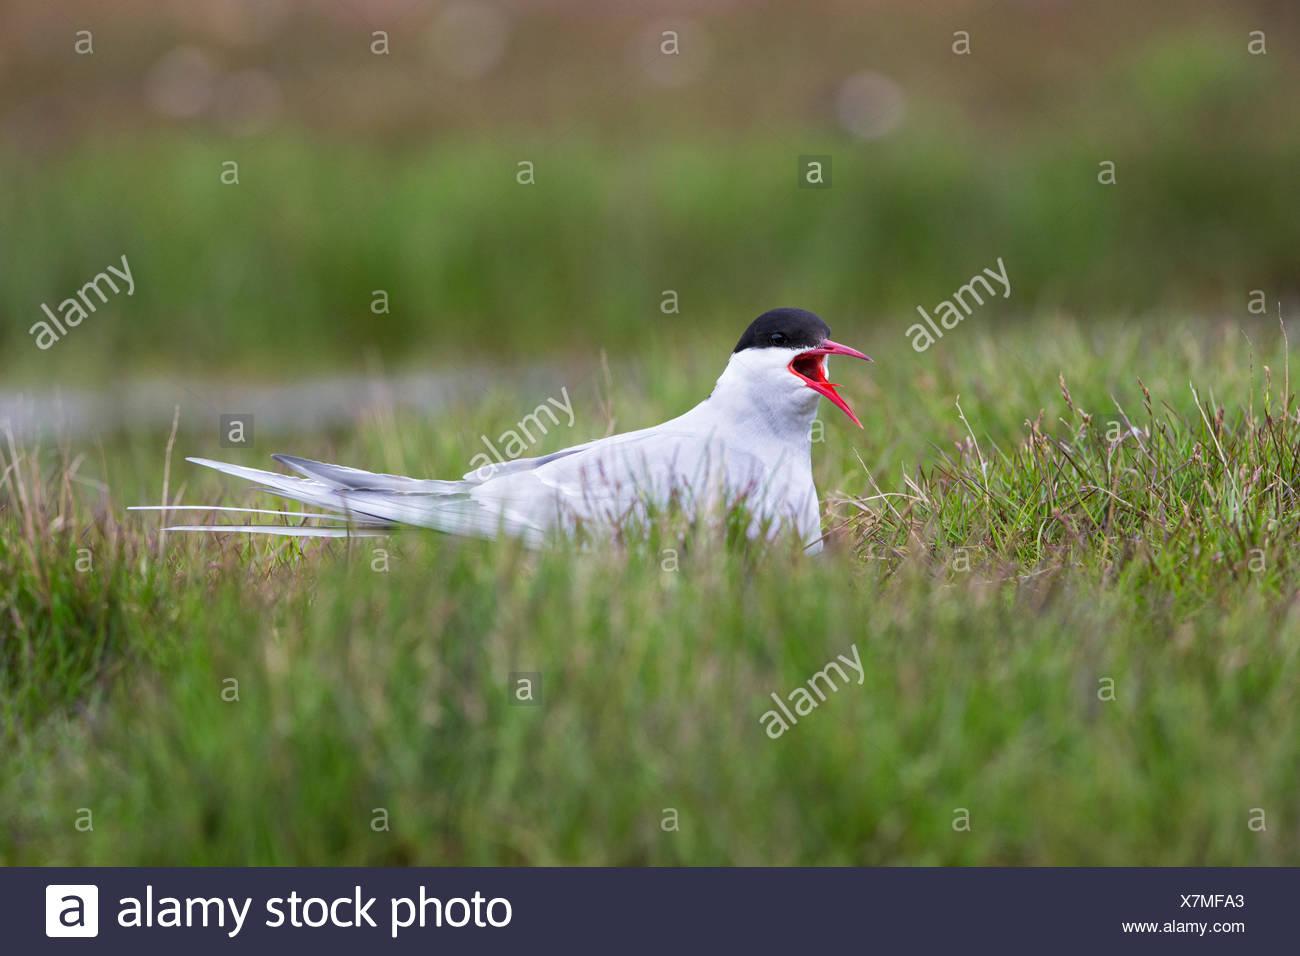 Arctic tern (Sterna paradisaea), calling, on nest, Longyearbyen, Svalbard Archipelago, Arctic Norway. - Stock Image